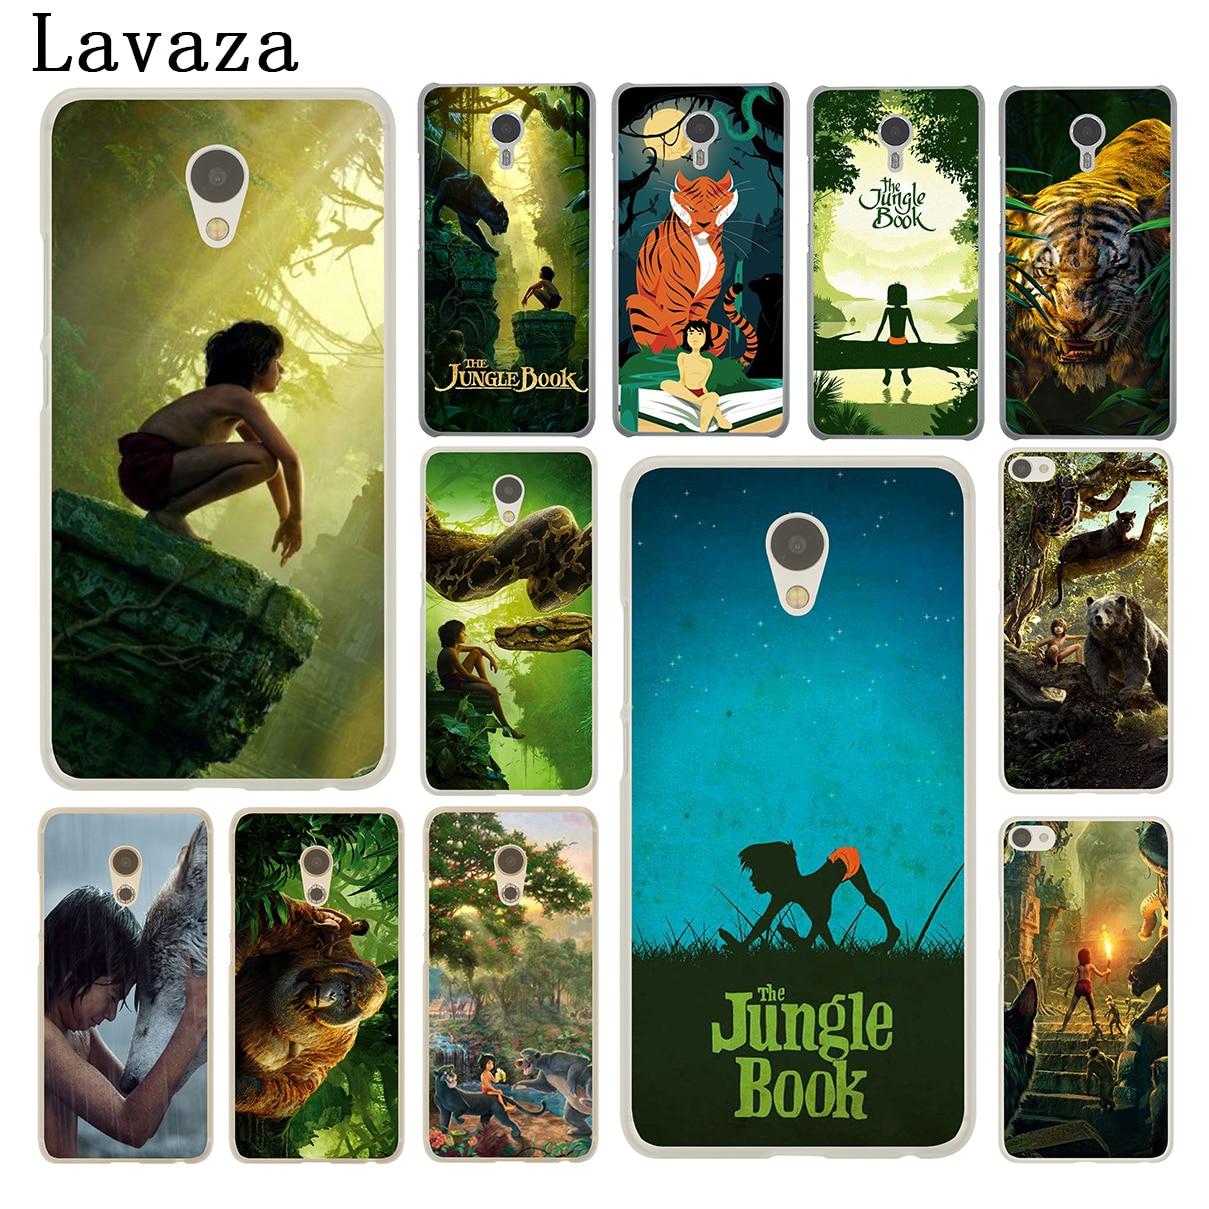 Lavaza The Jungle Book Hard Phone Shell Case for Meizu M5C M6 M5 M5S M2 M3 M3S Mini Note U10 U20 Pro 7 Plus 6 Cover